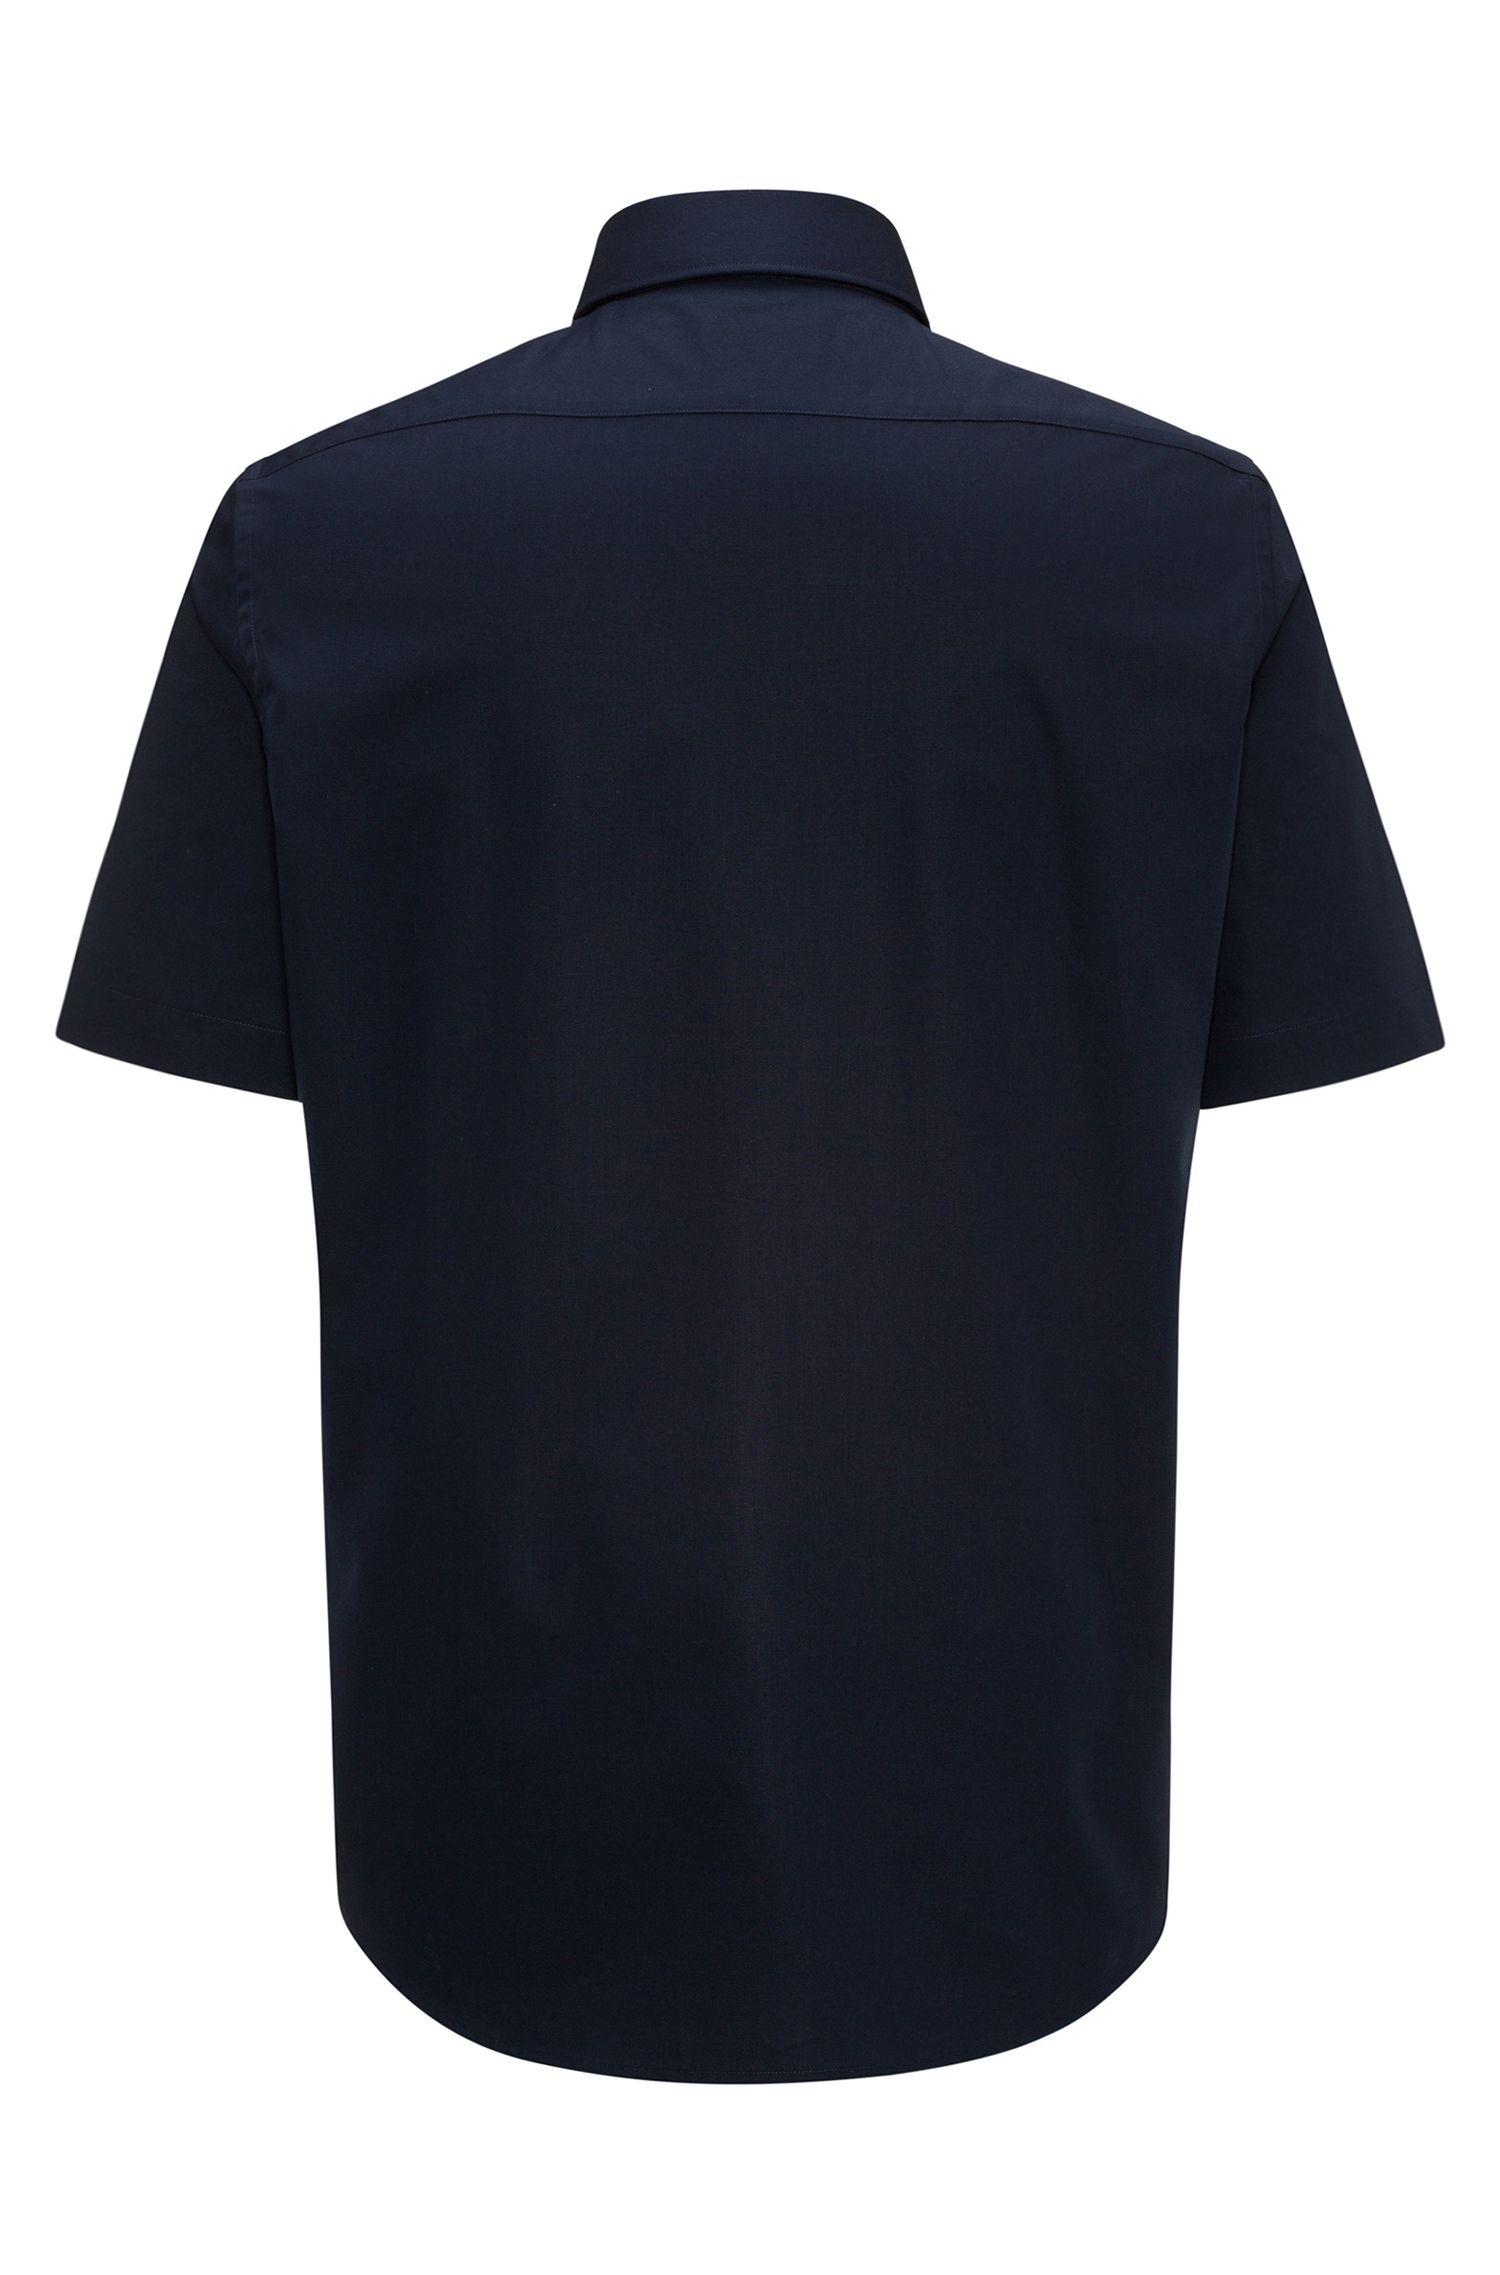 Regular-Fit Kurzarm-Hemd aus Baumwoll-Popeline